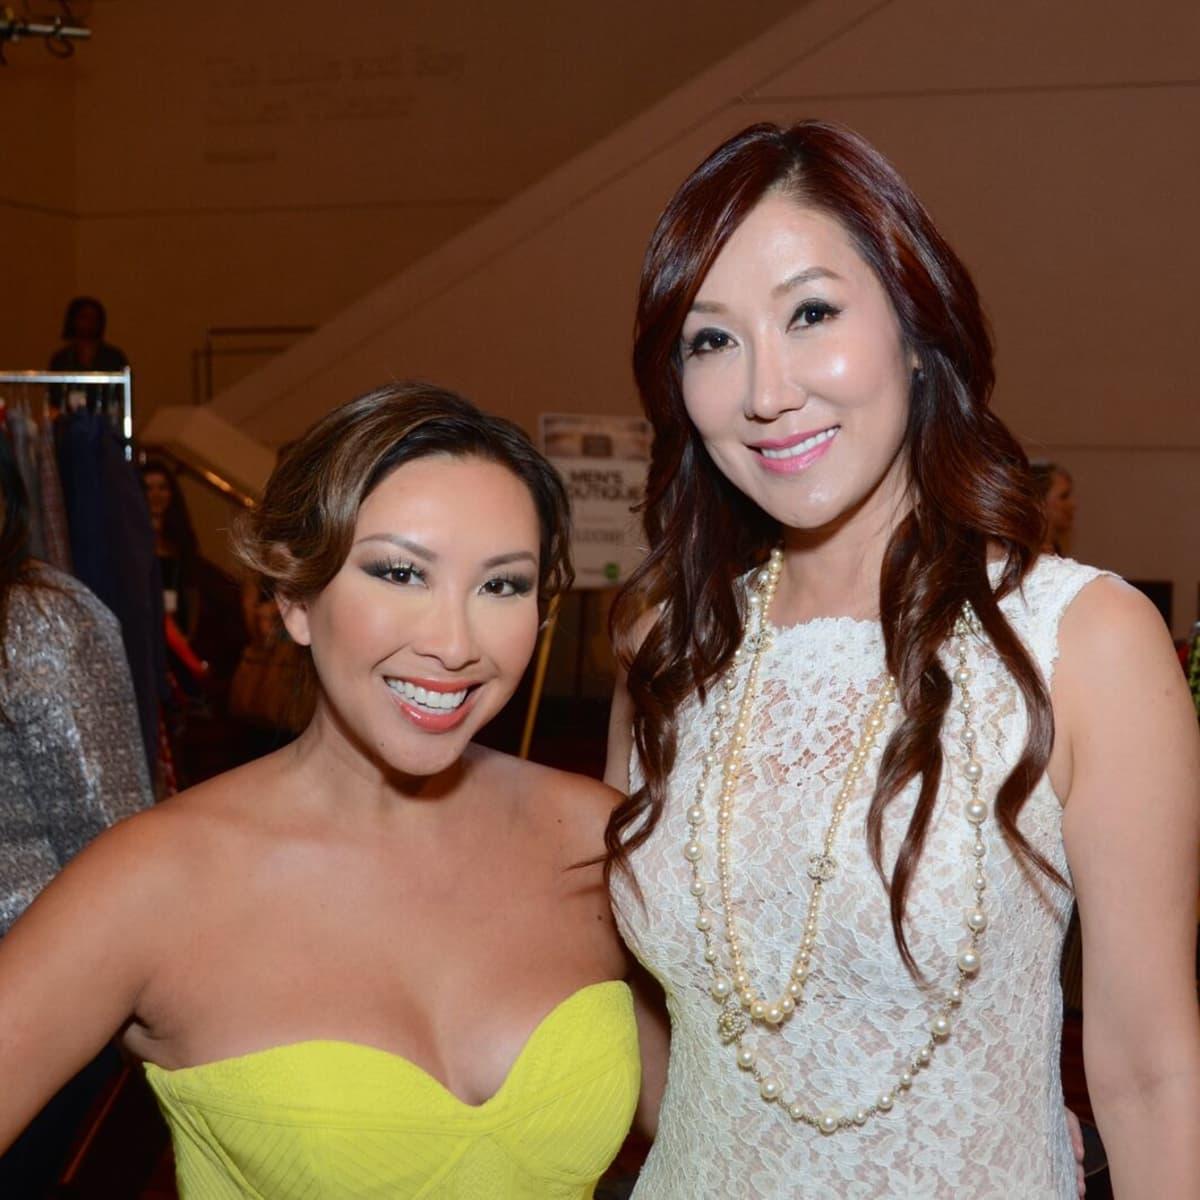 News, Shelby, The Women's Home, Aug. 2015, Lily Jang, Mandy Kao